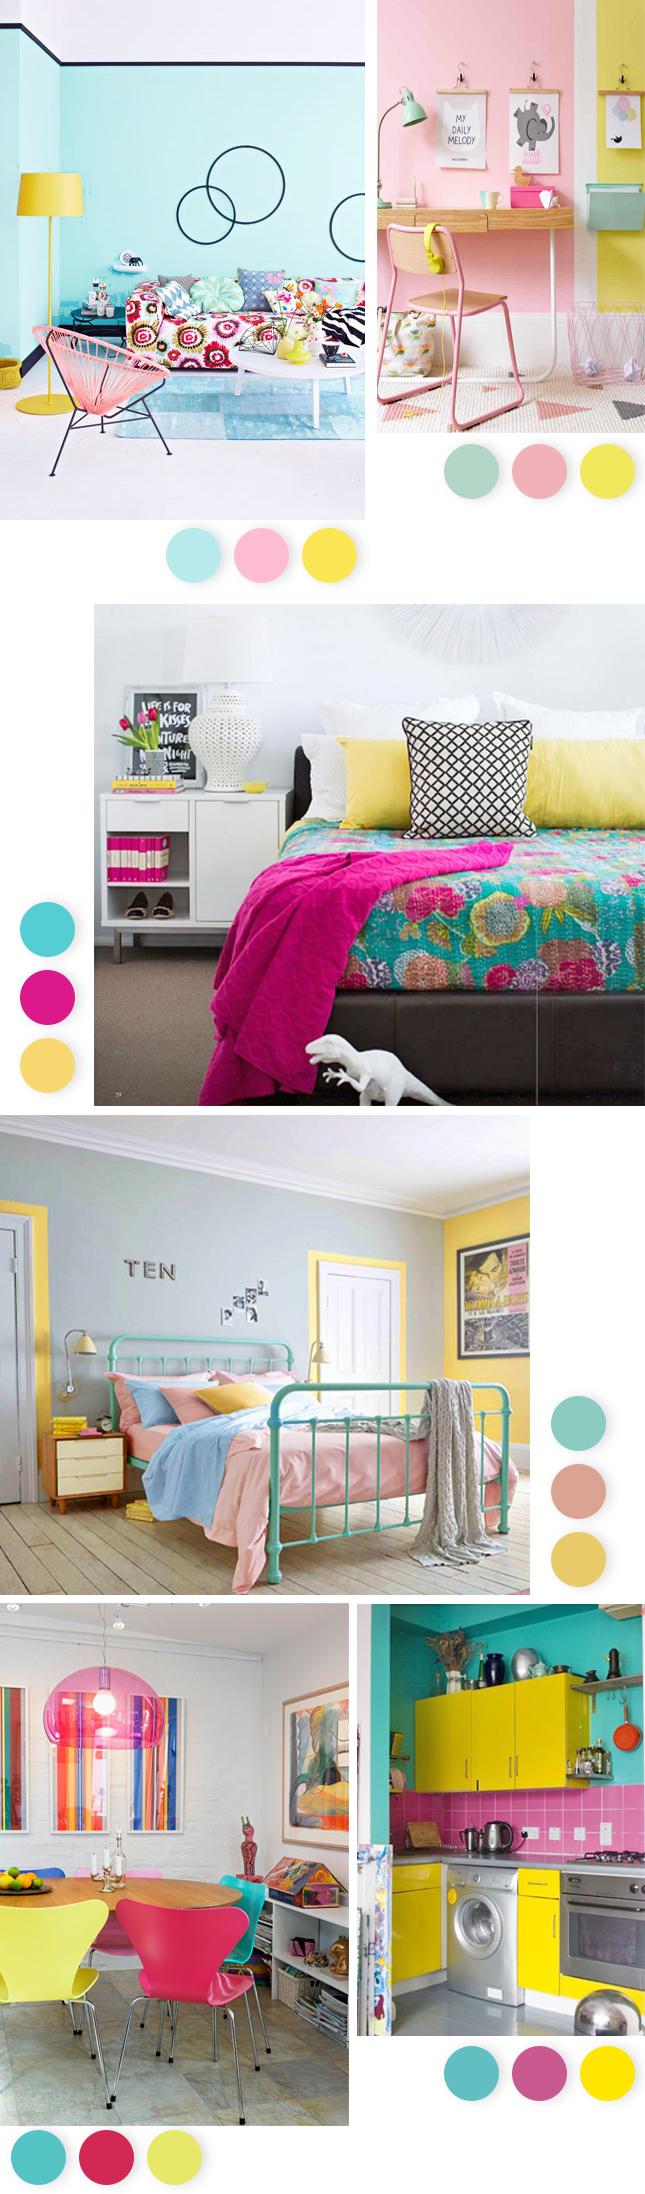 decoradornet-turquesa-rosa-amarelo